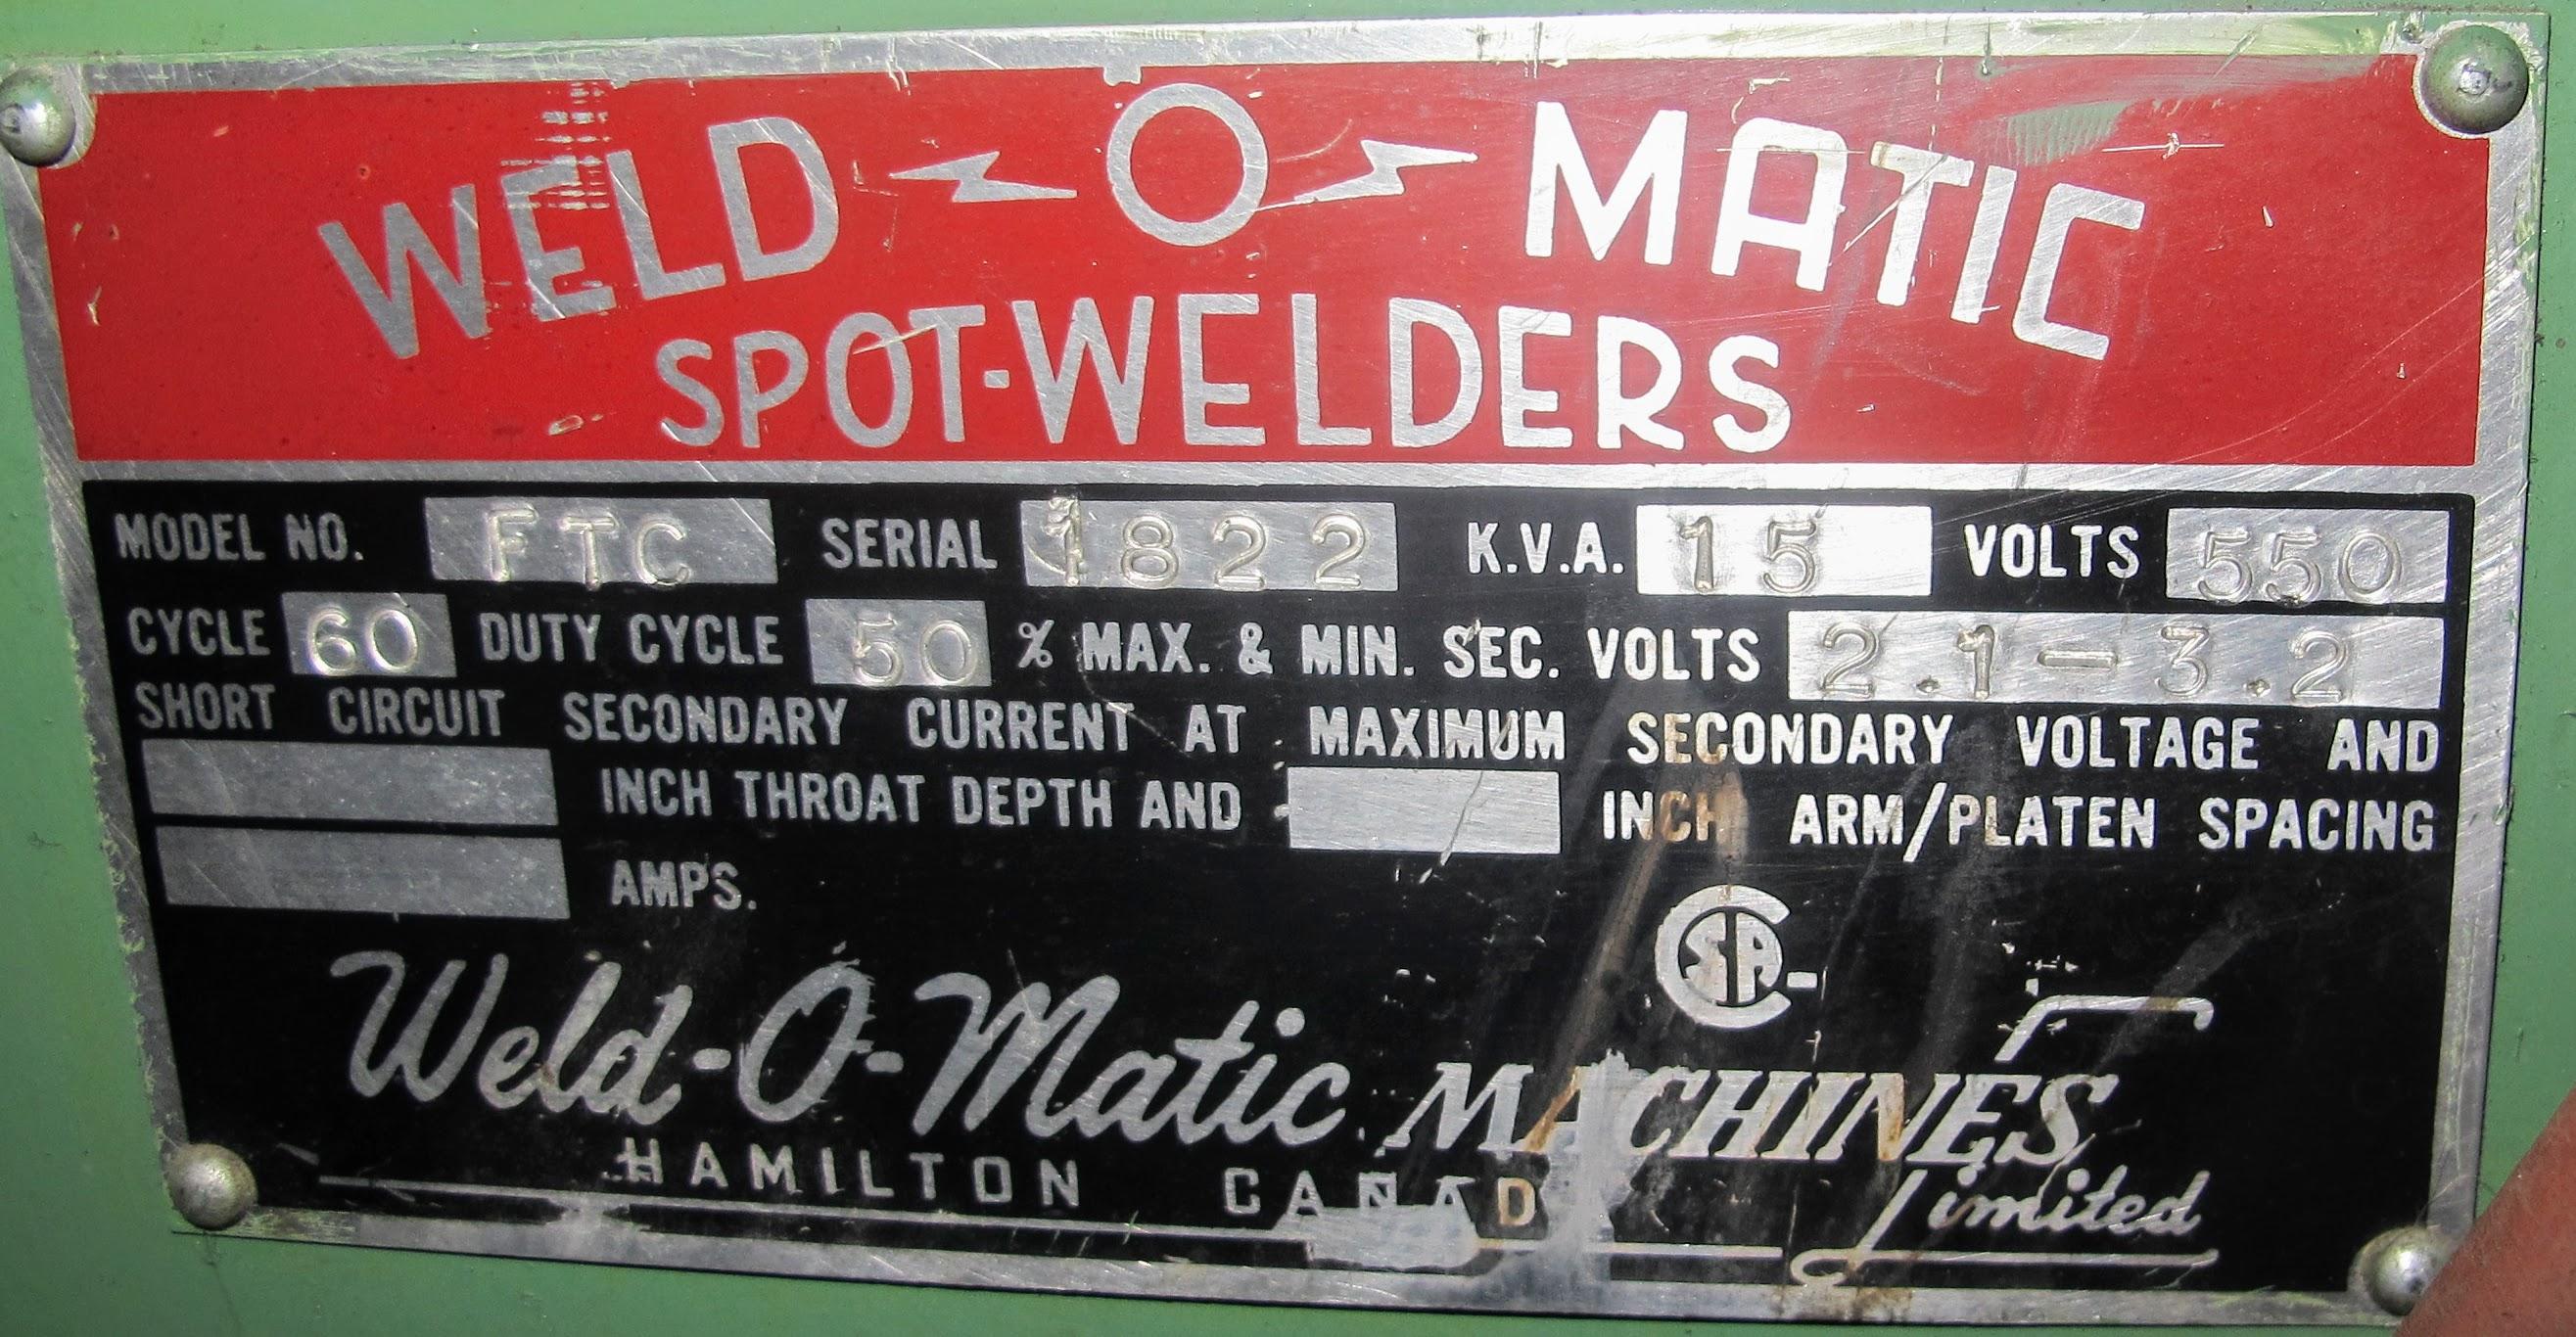 "WELD-O-MATIC FTC SPOT WELDER, 15KVA, 12"" THROAT, S/N 1822 - Image 4 of 4"